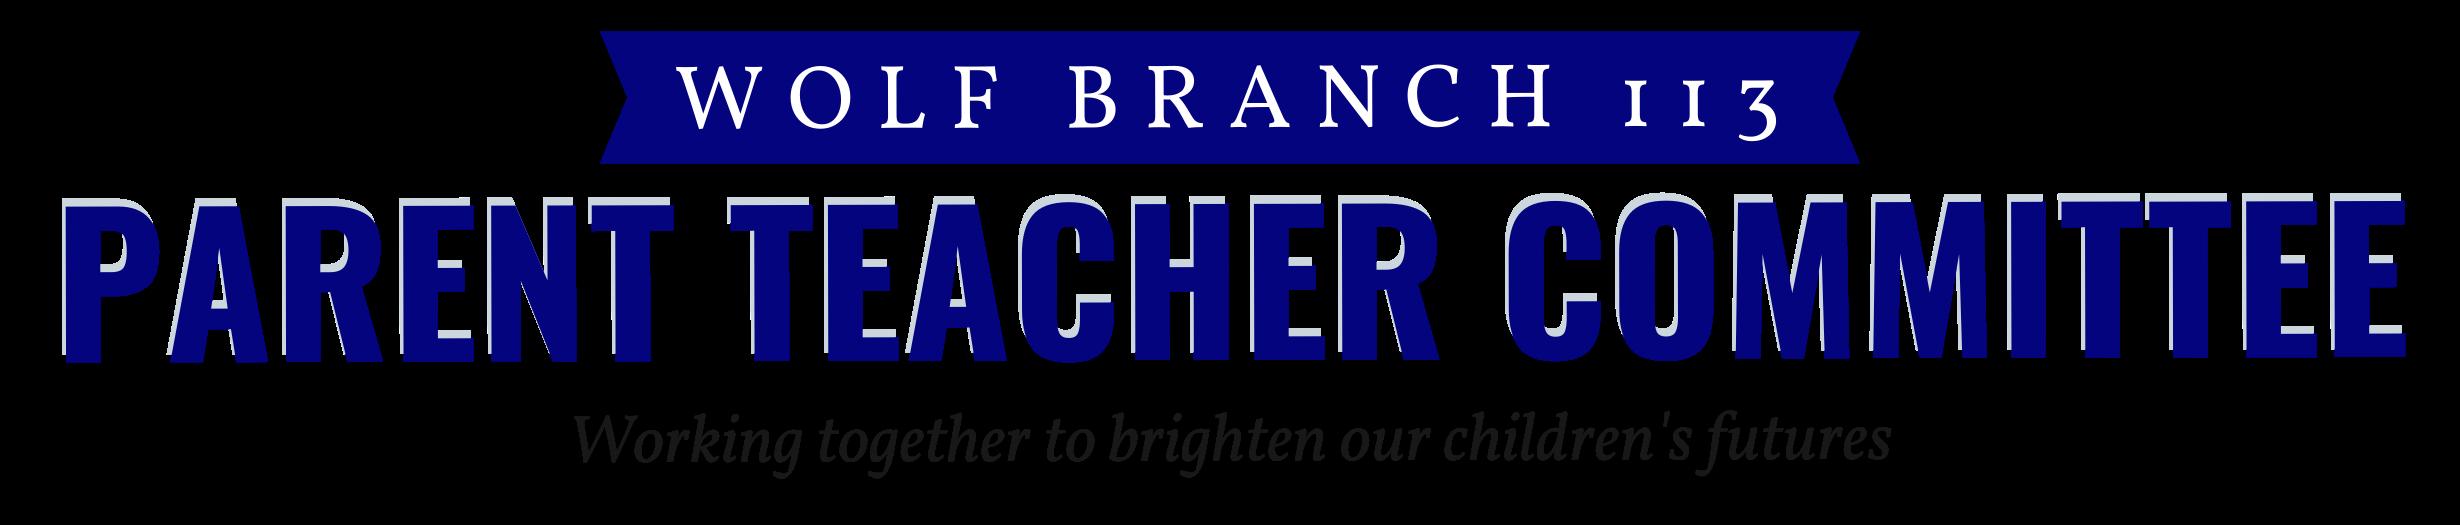 WOLF BRANCH PTC